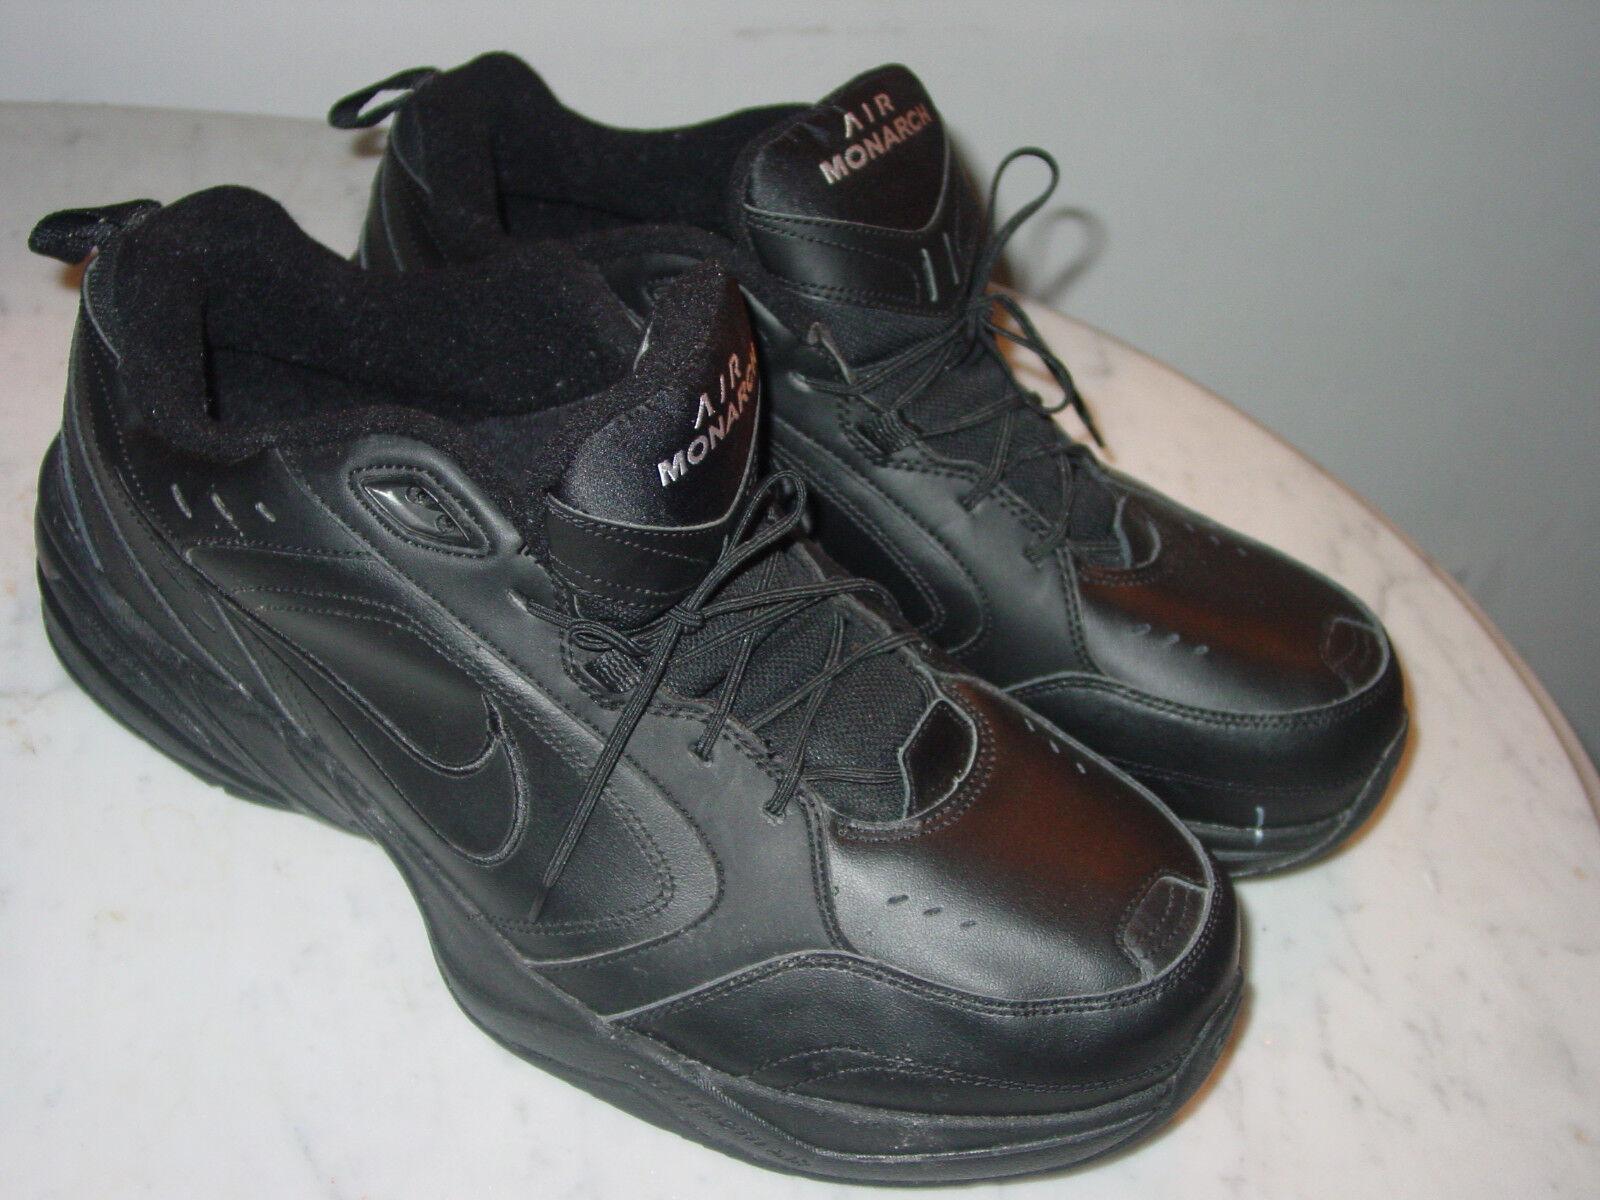 2010 Nike Air Monarch IV Black Running Shoes! Comfortable Cheap women's shoes women's shoes